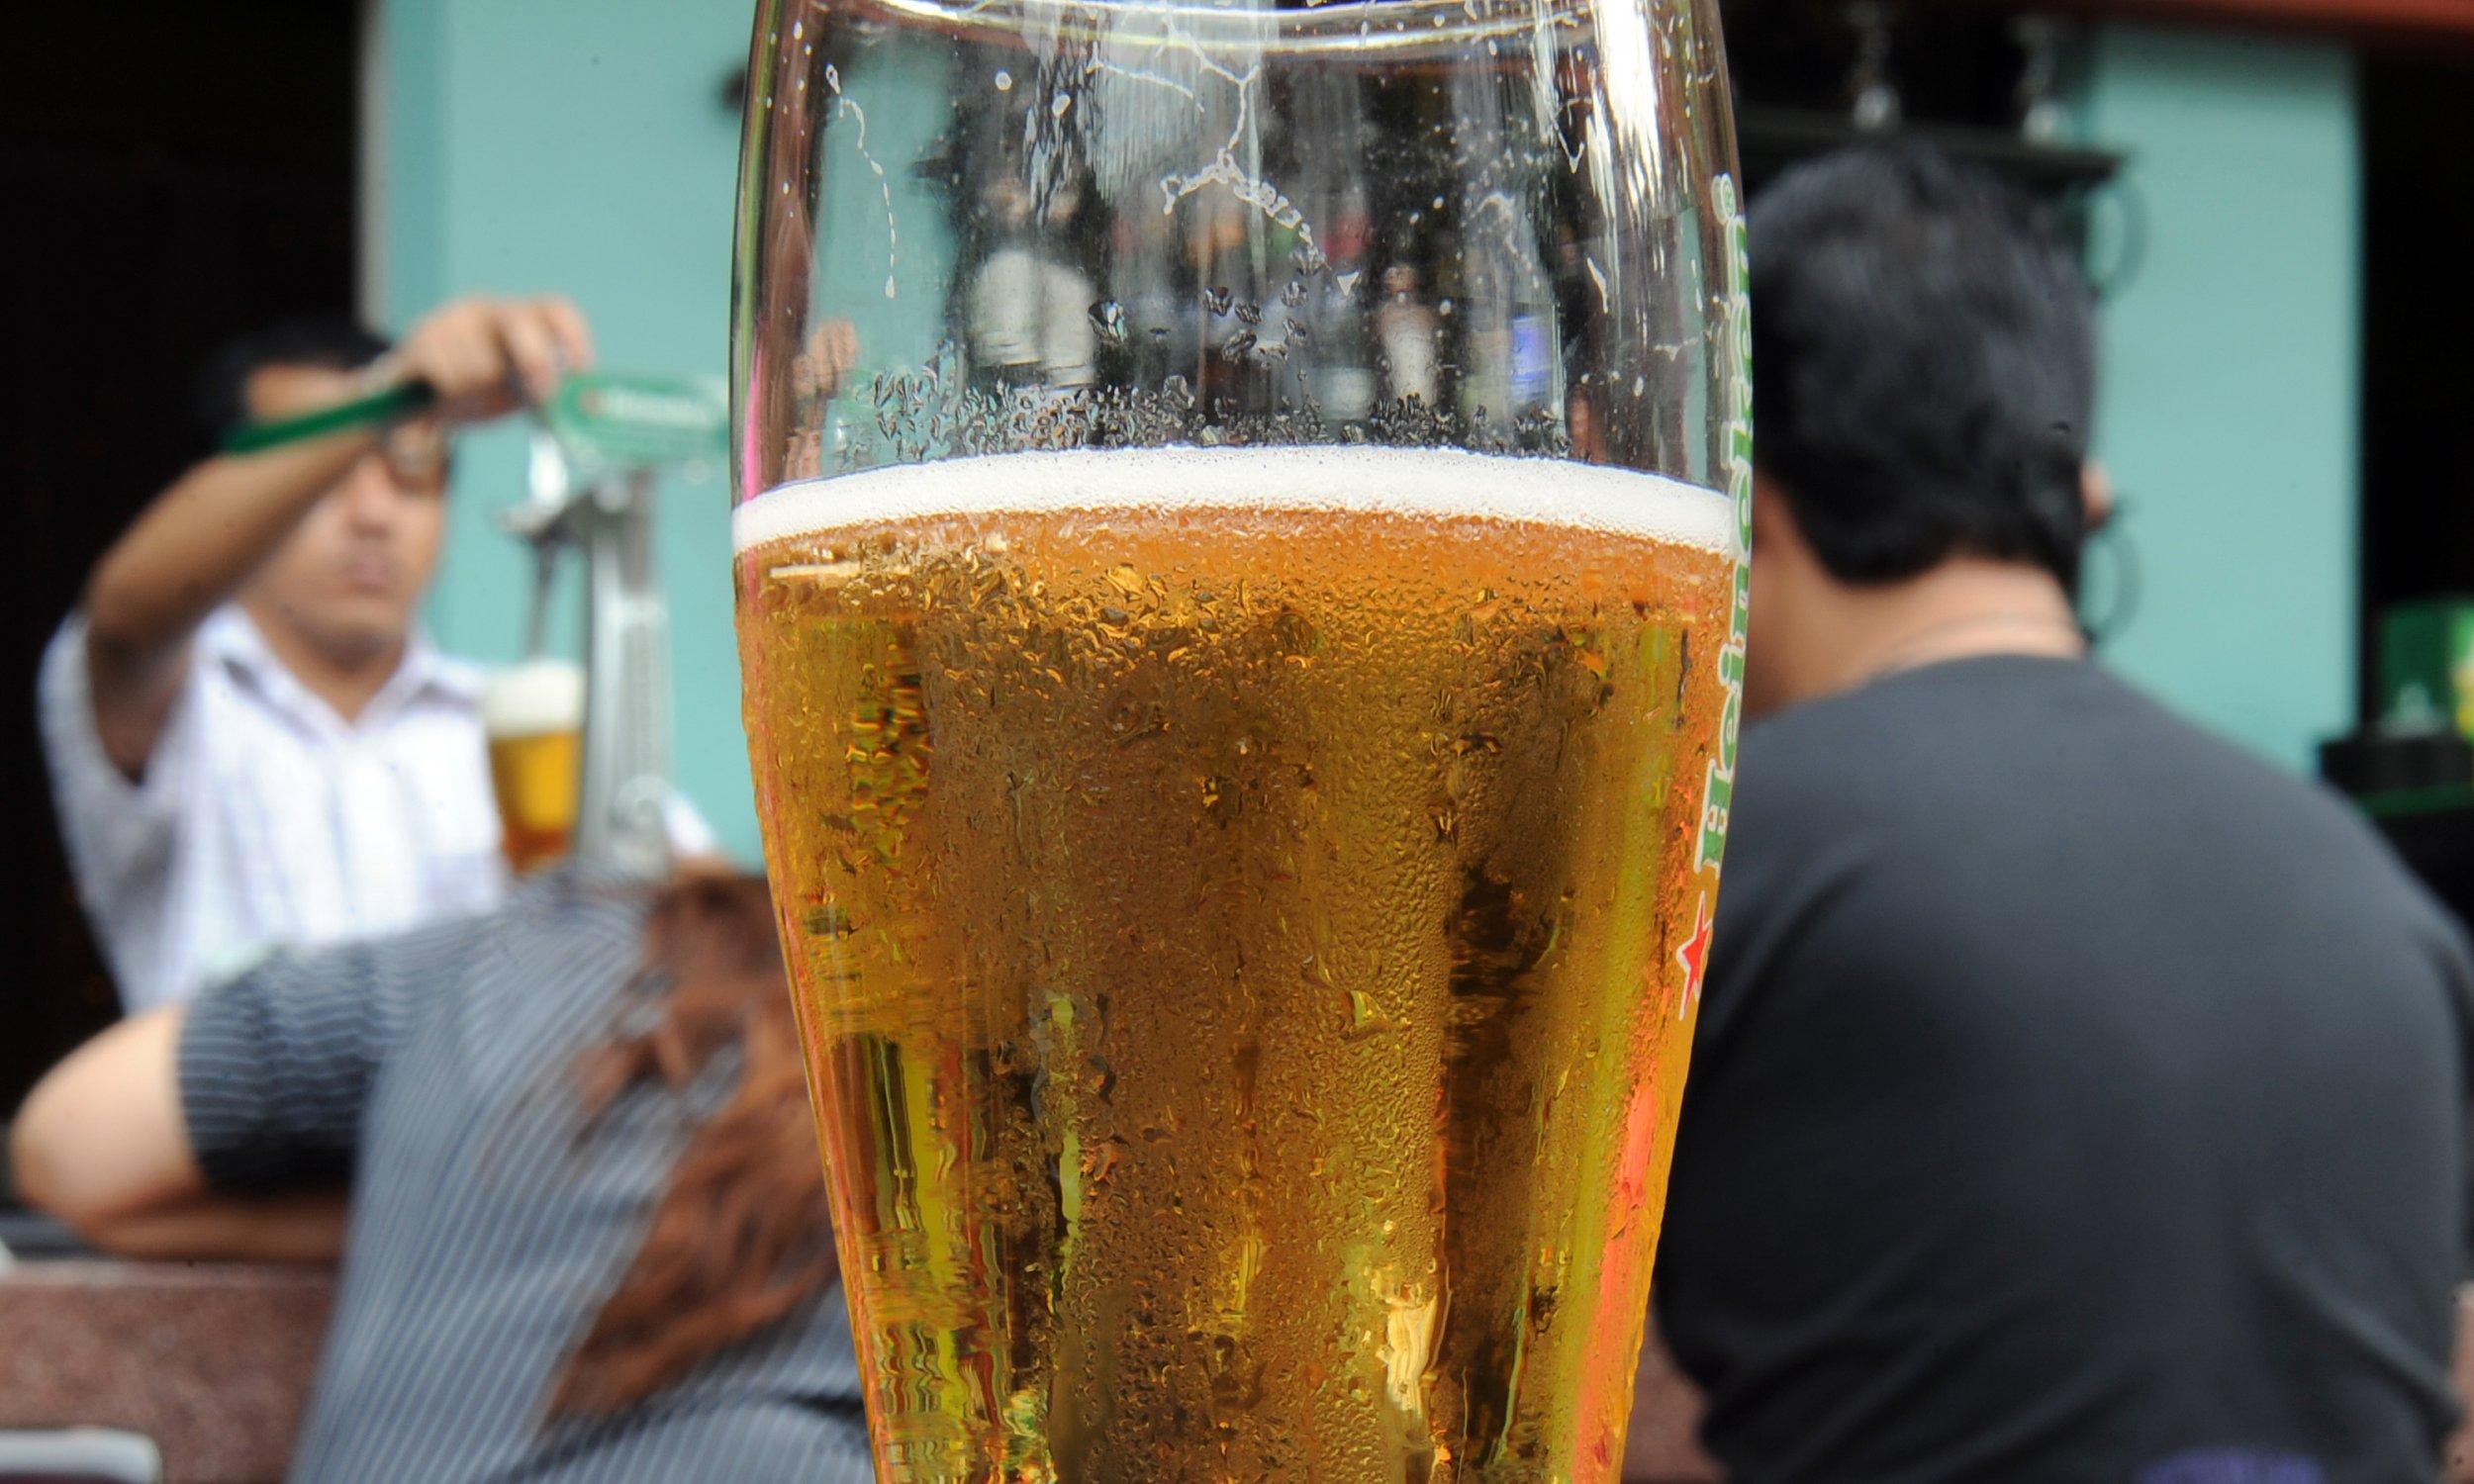 Malaysia beer